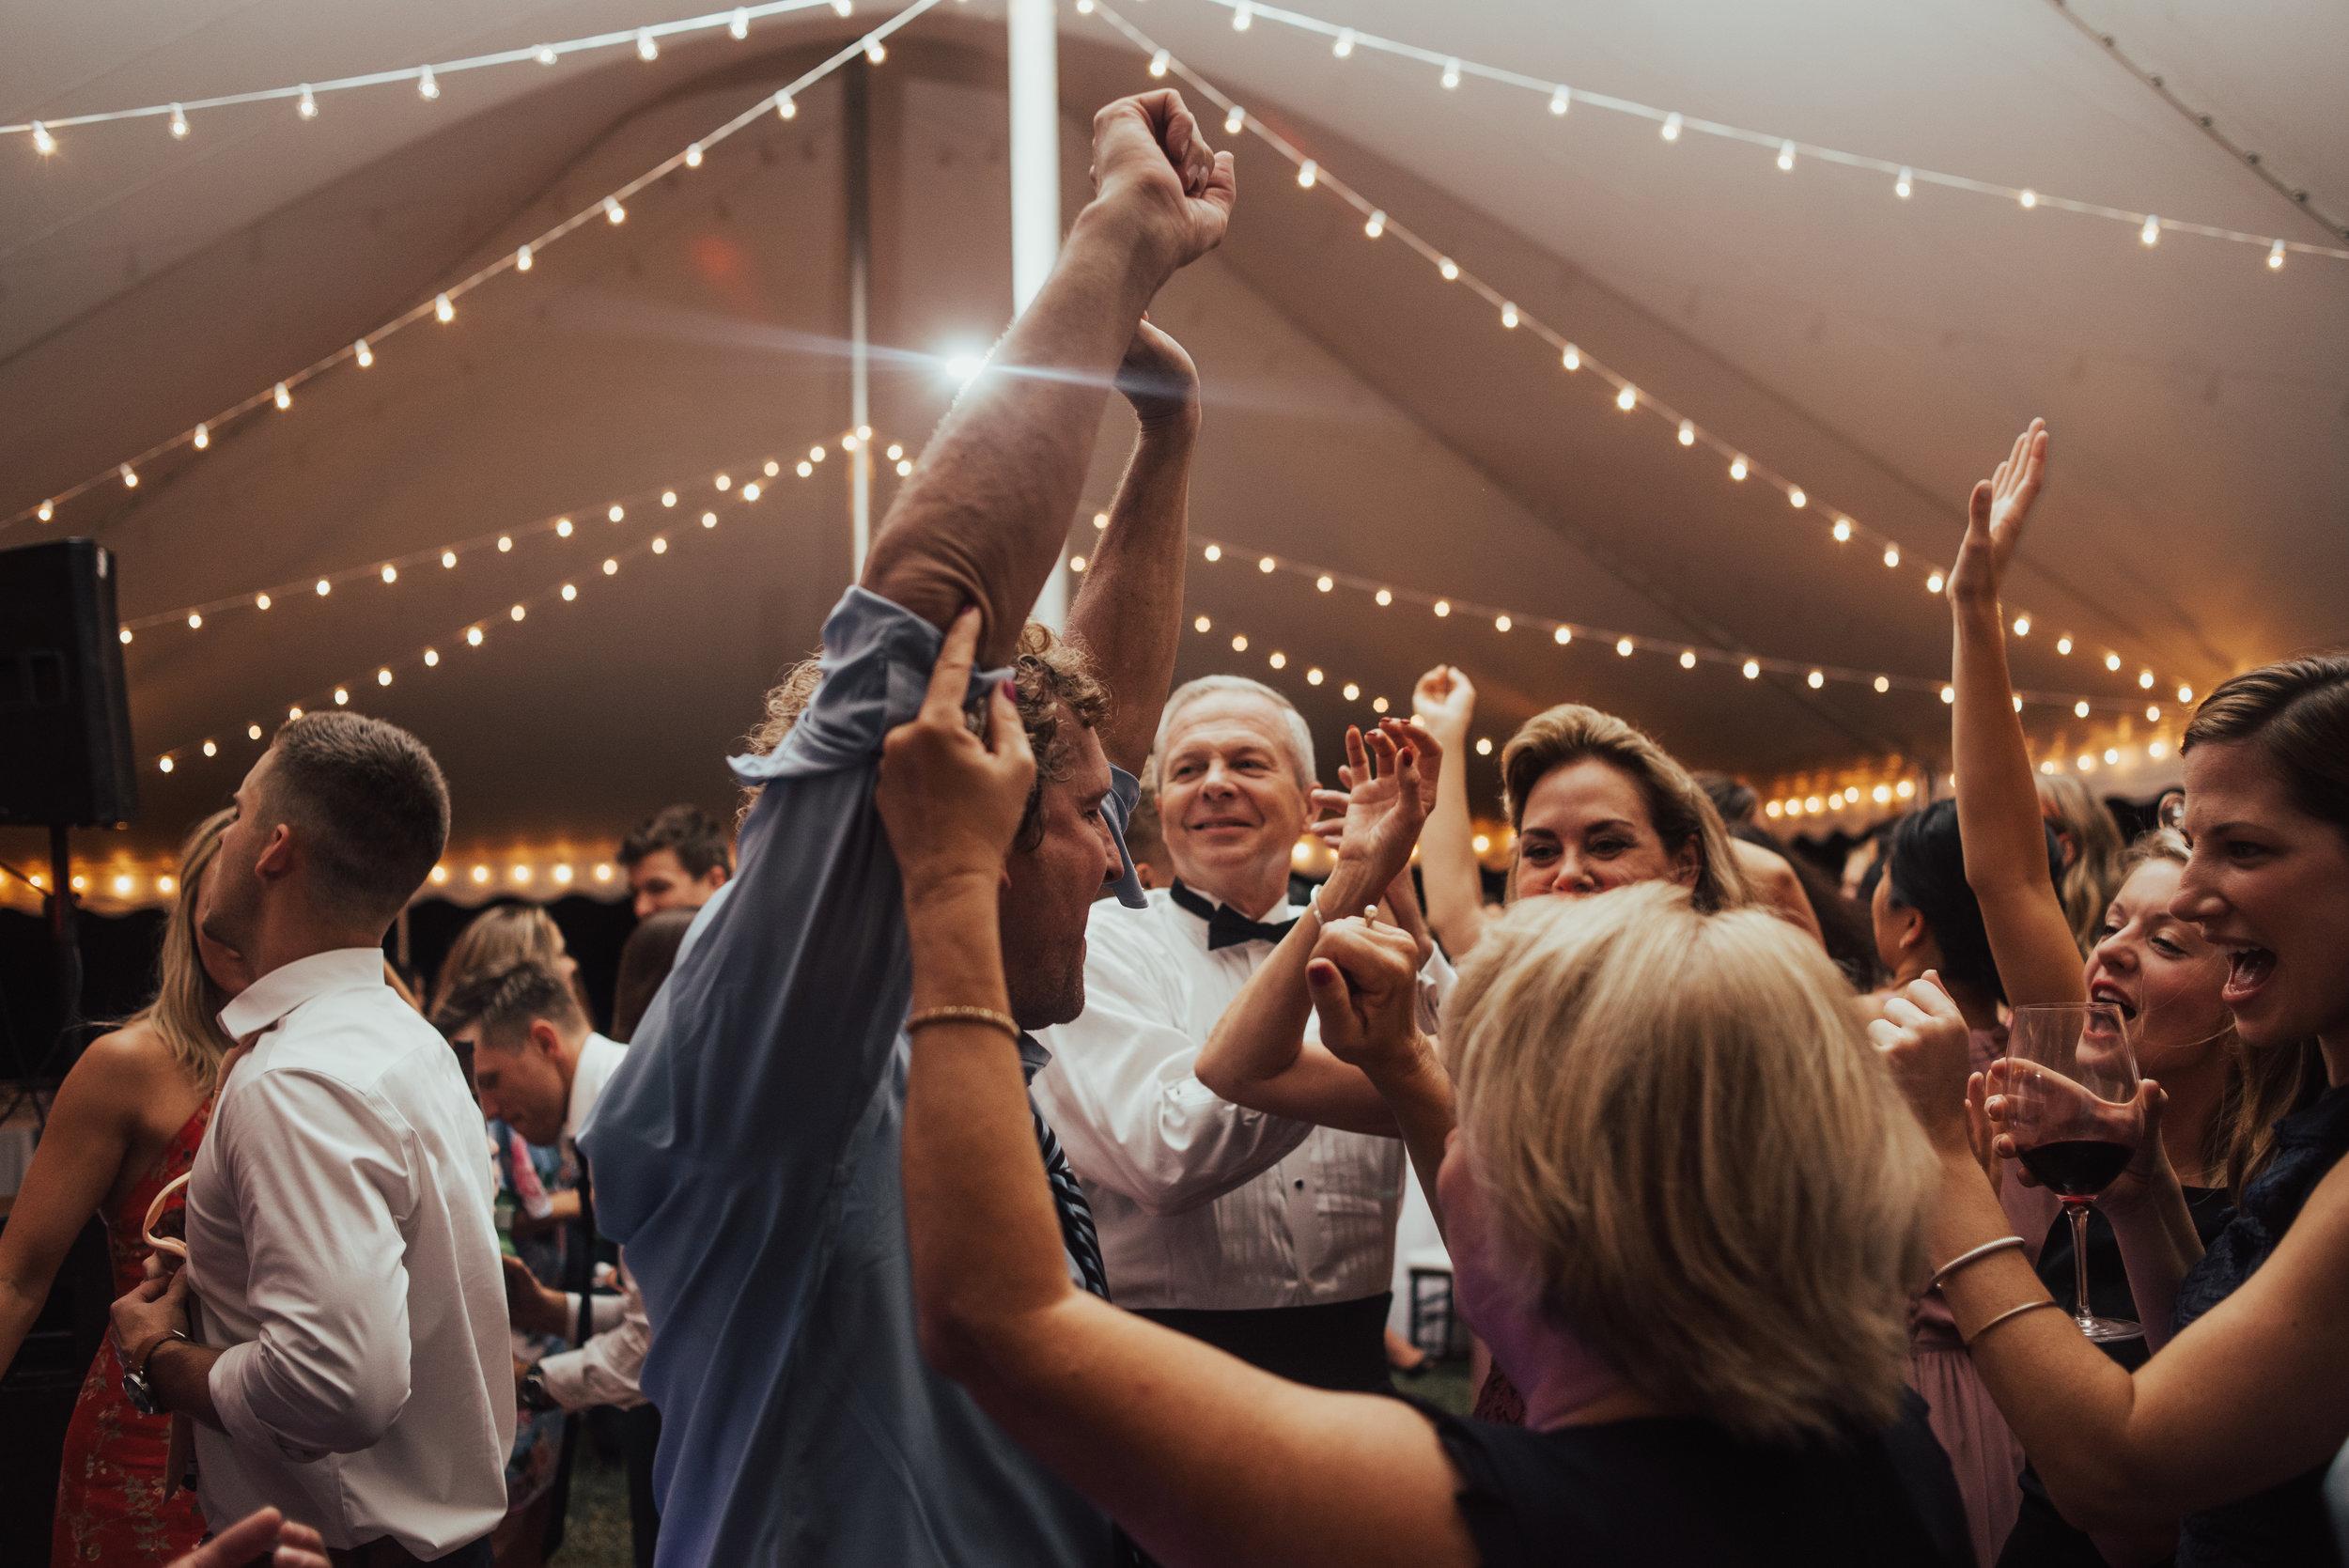 Smithfield Wedding By SB Photographs3963963963960396396396396396396396.jpg